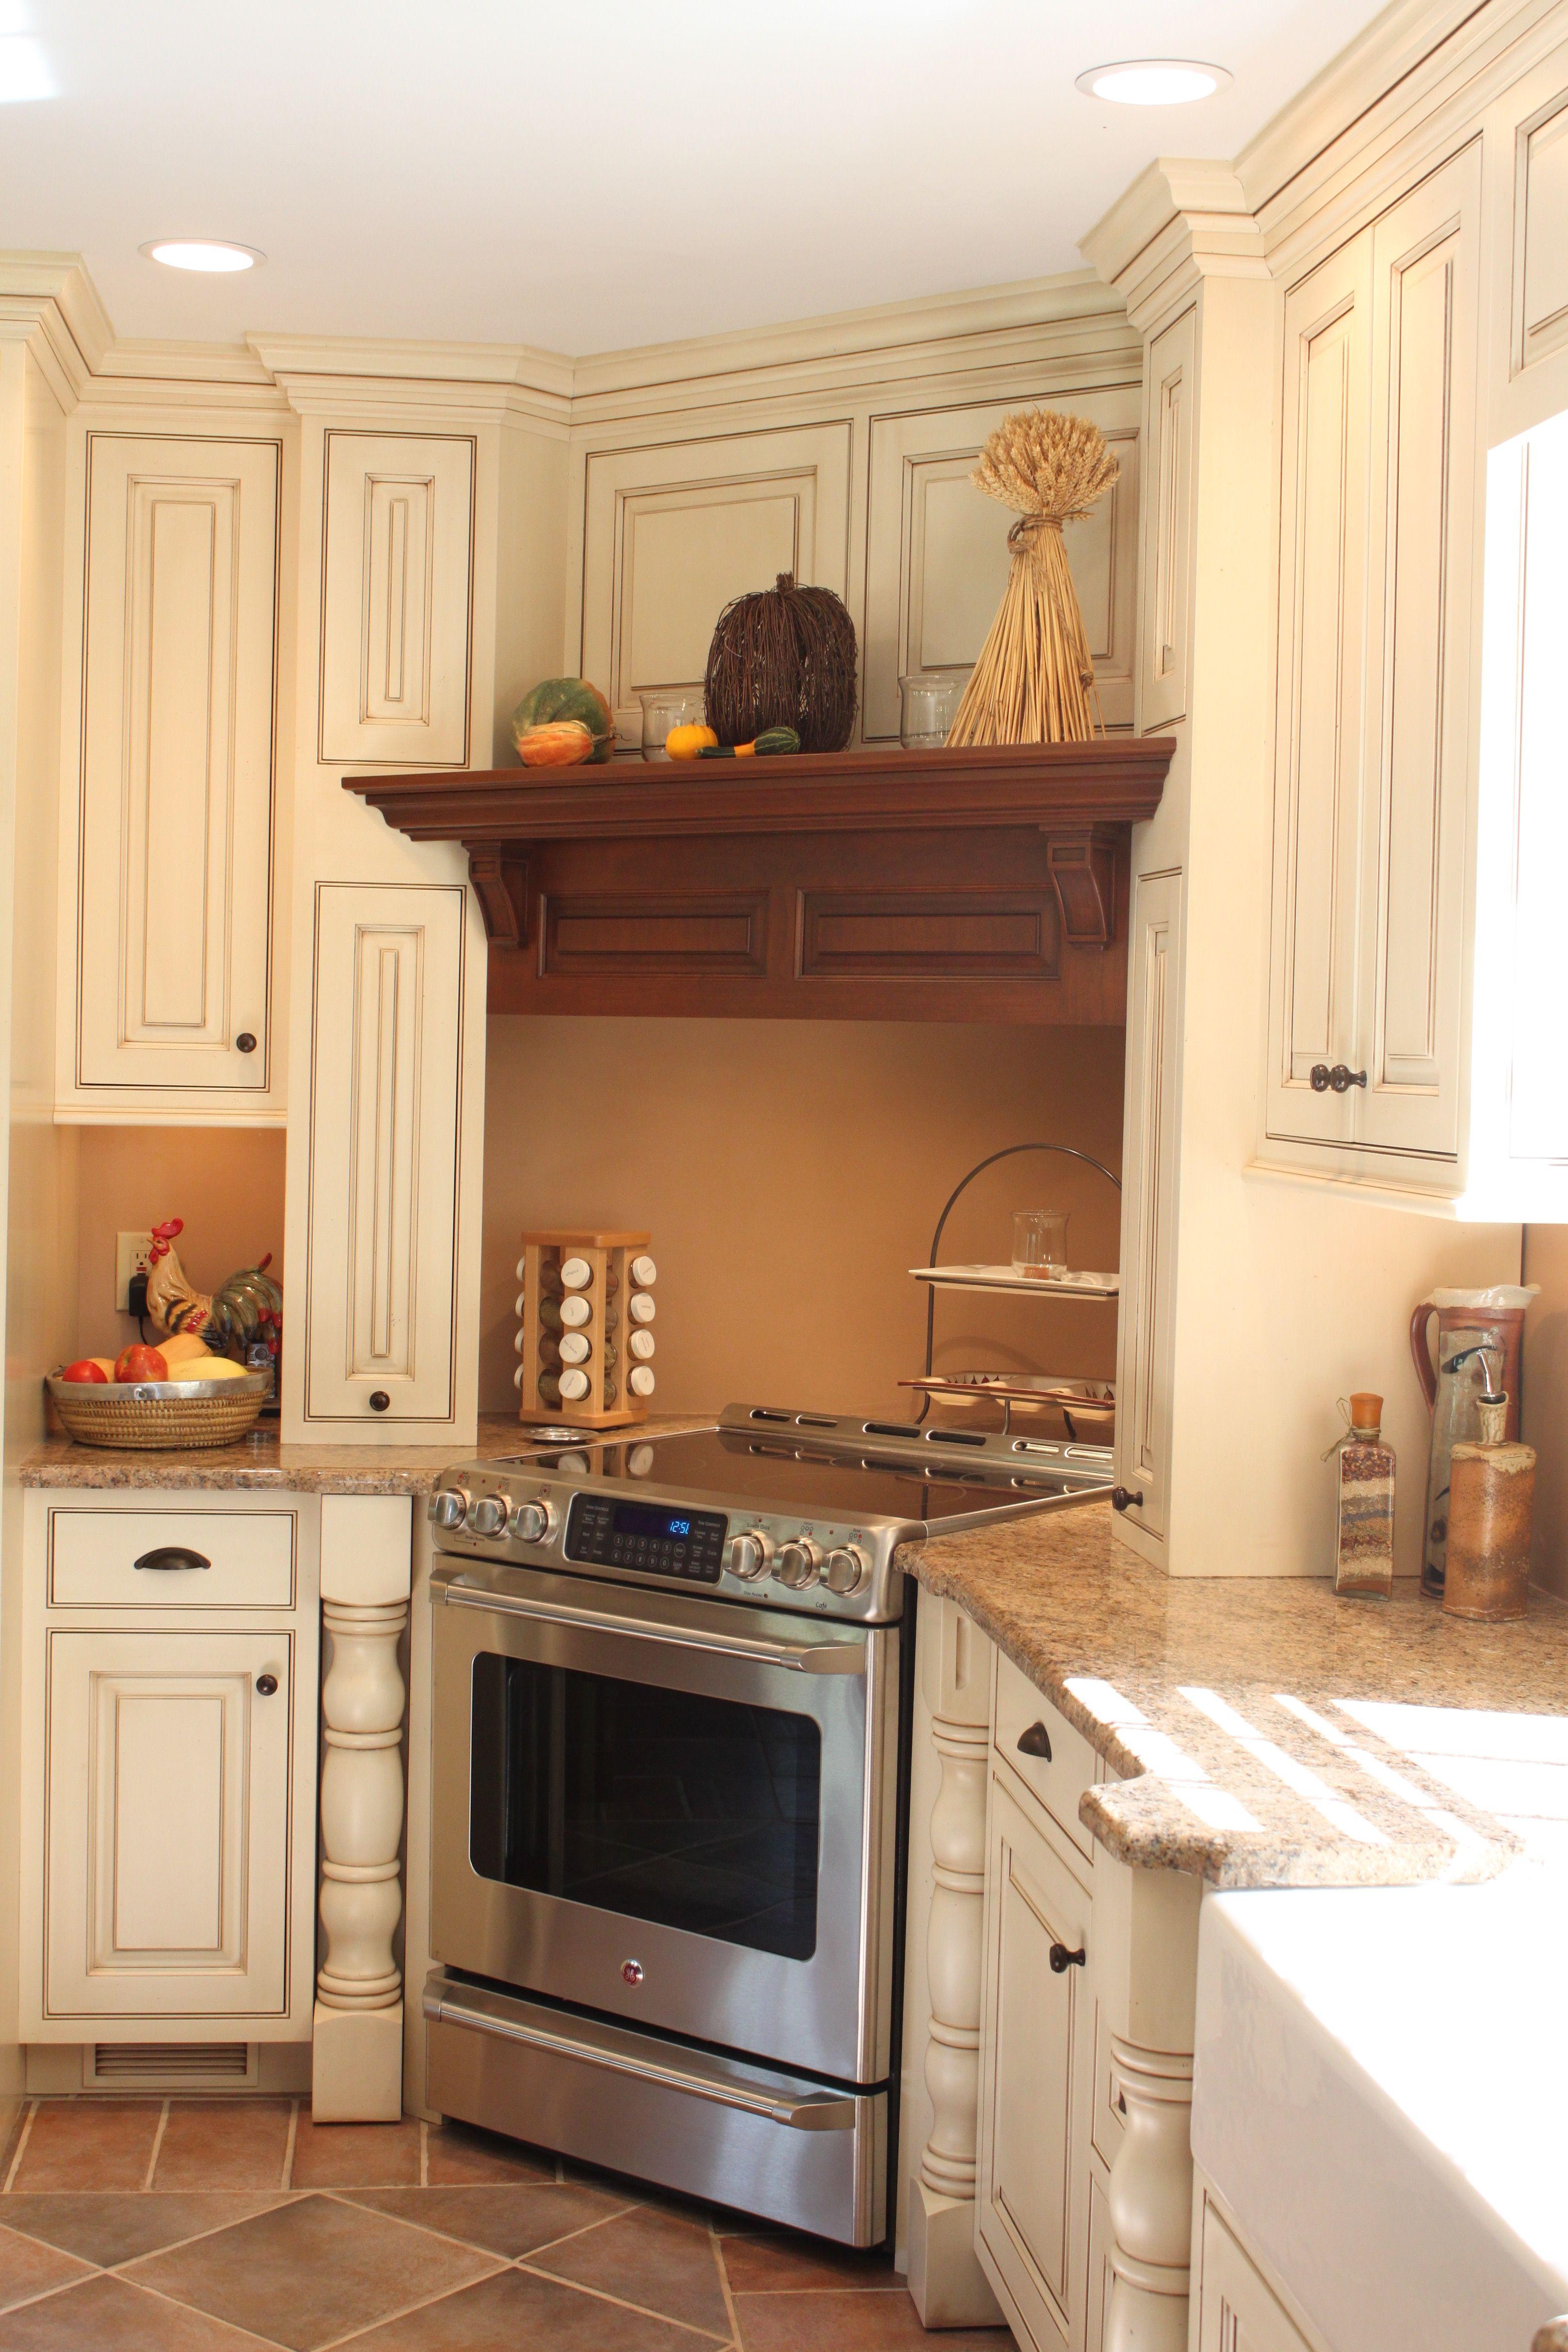 custom wood hood in corner | Wood hood vent, Kitchen space ...